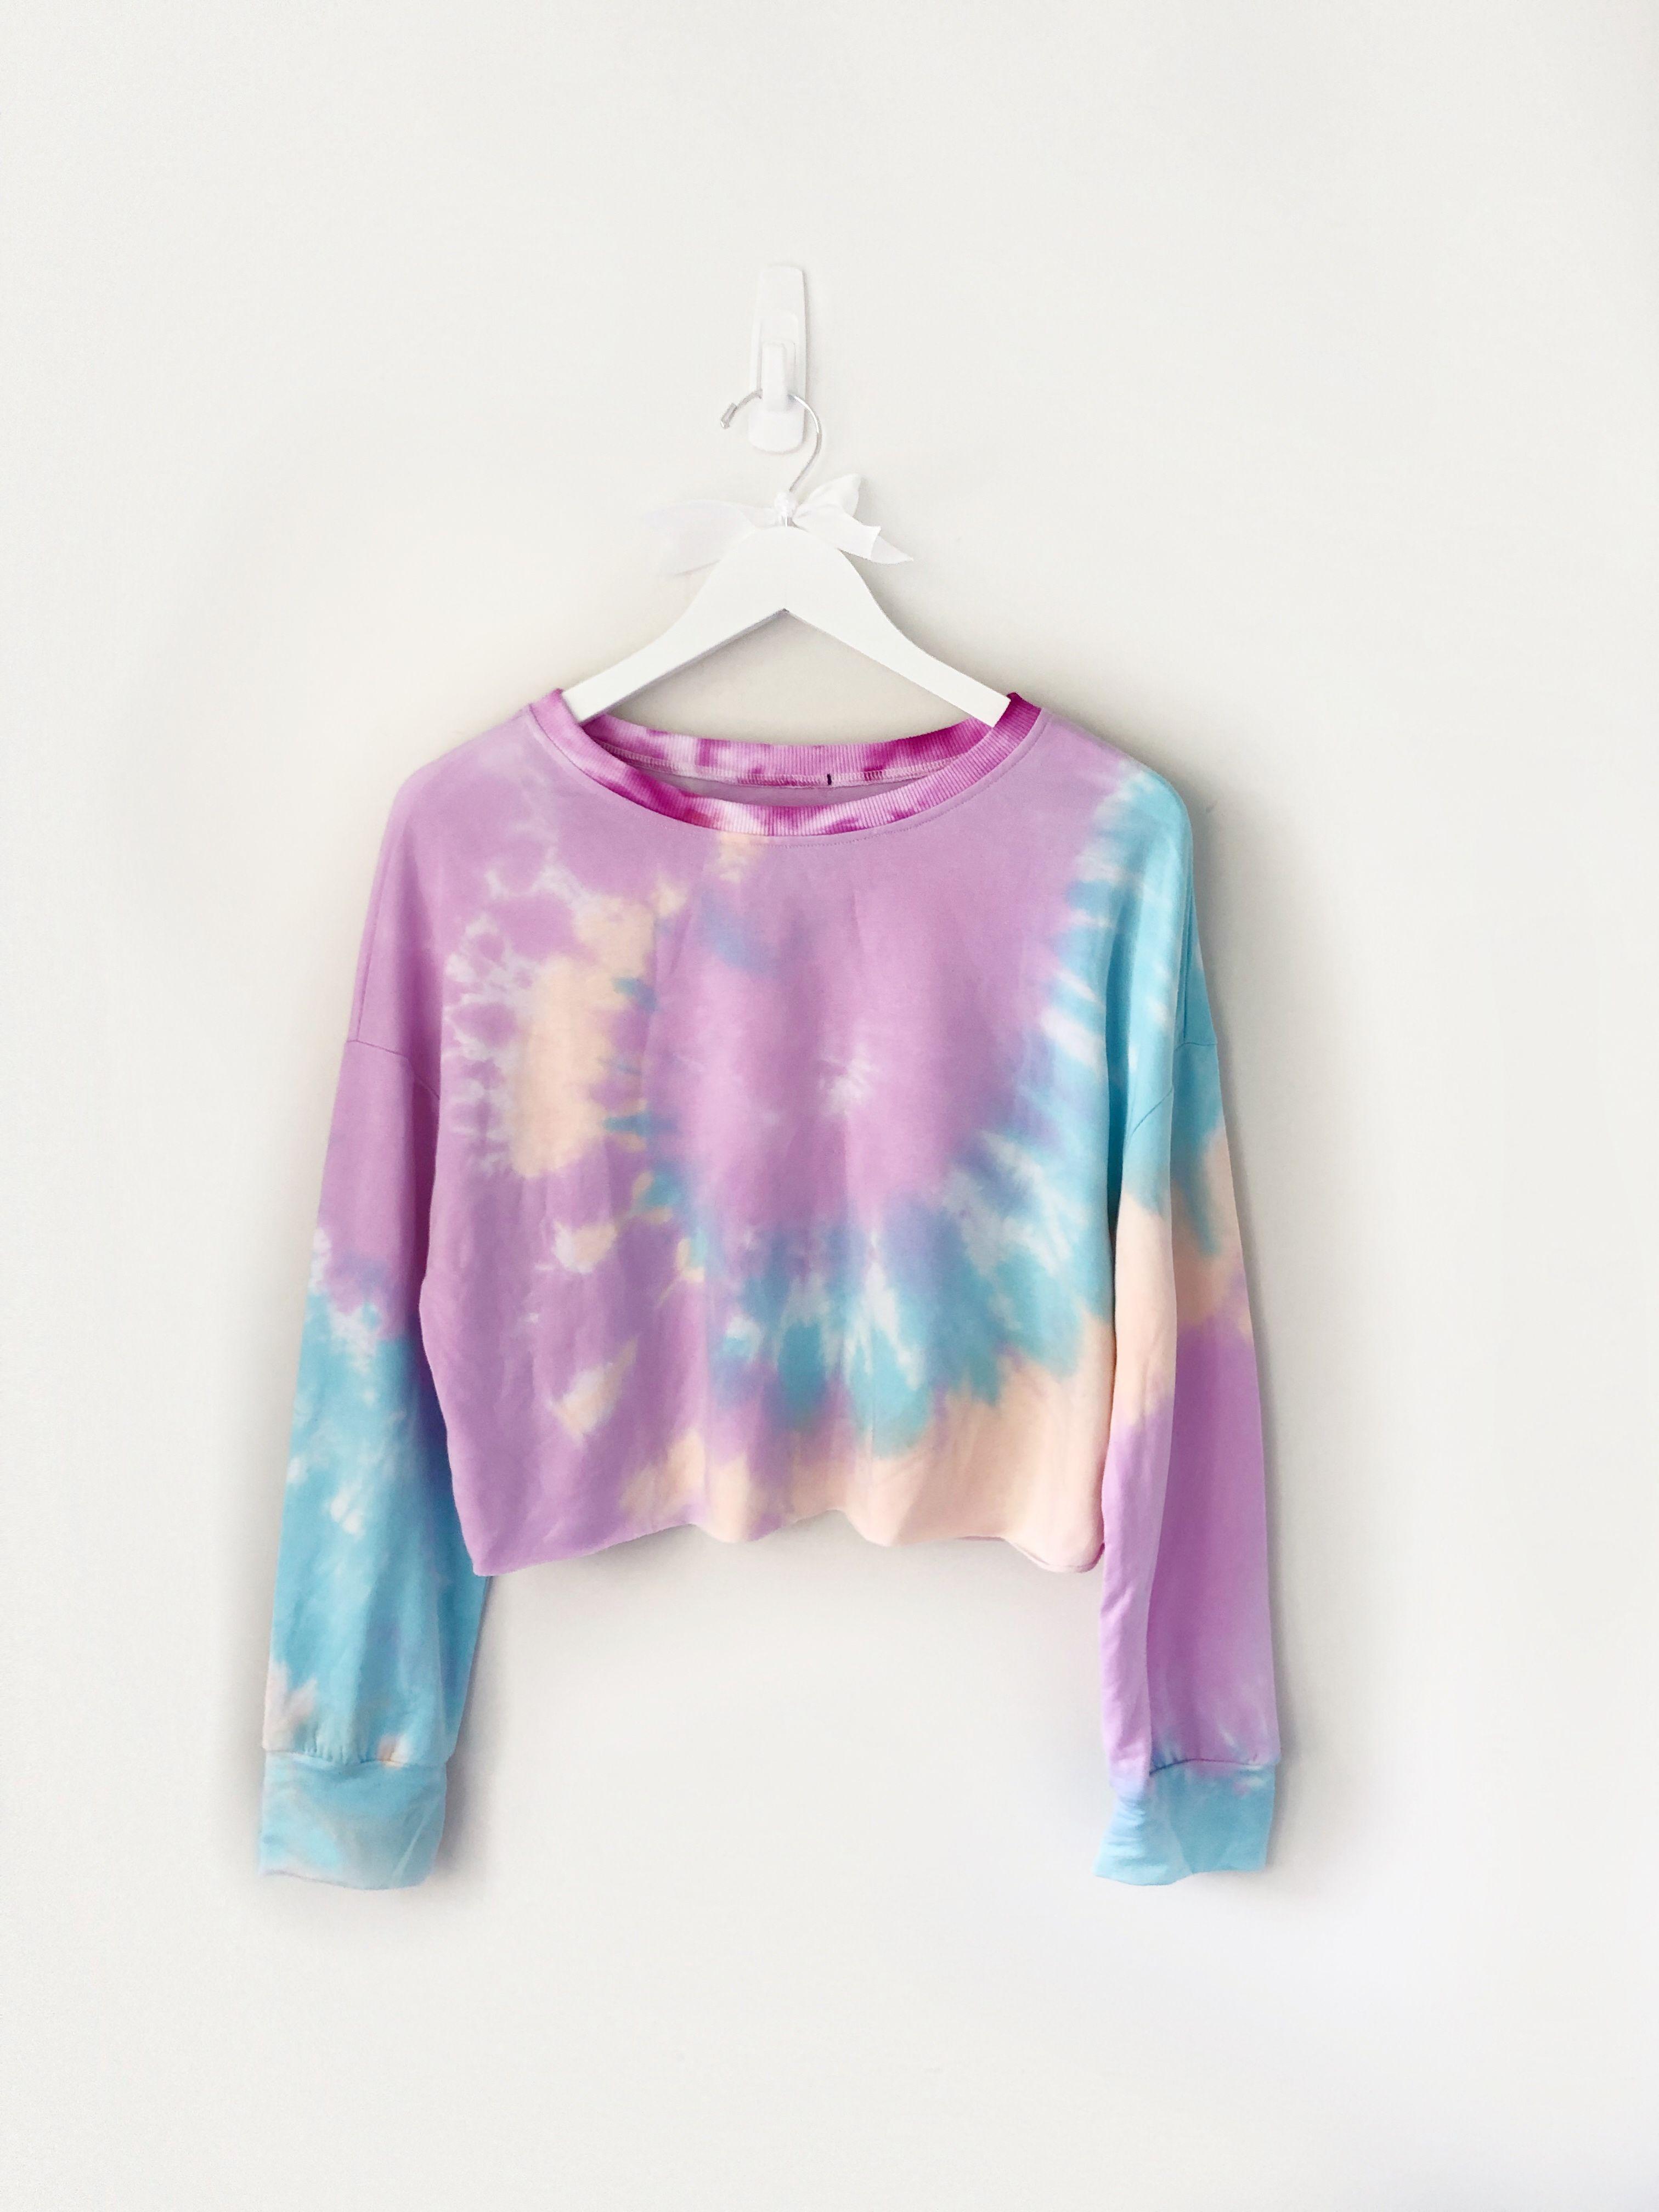 Totally Croppy 3 Tie Dye Cropped Drop Shoulder Pull Over Etsy Tie Dye Tie Dye Crop Top Crop Top Sweatshirt [ 4032 x 3024 Pixel ]